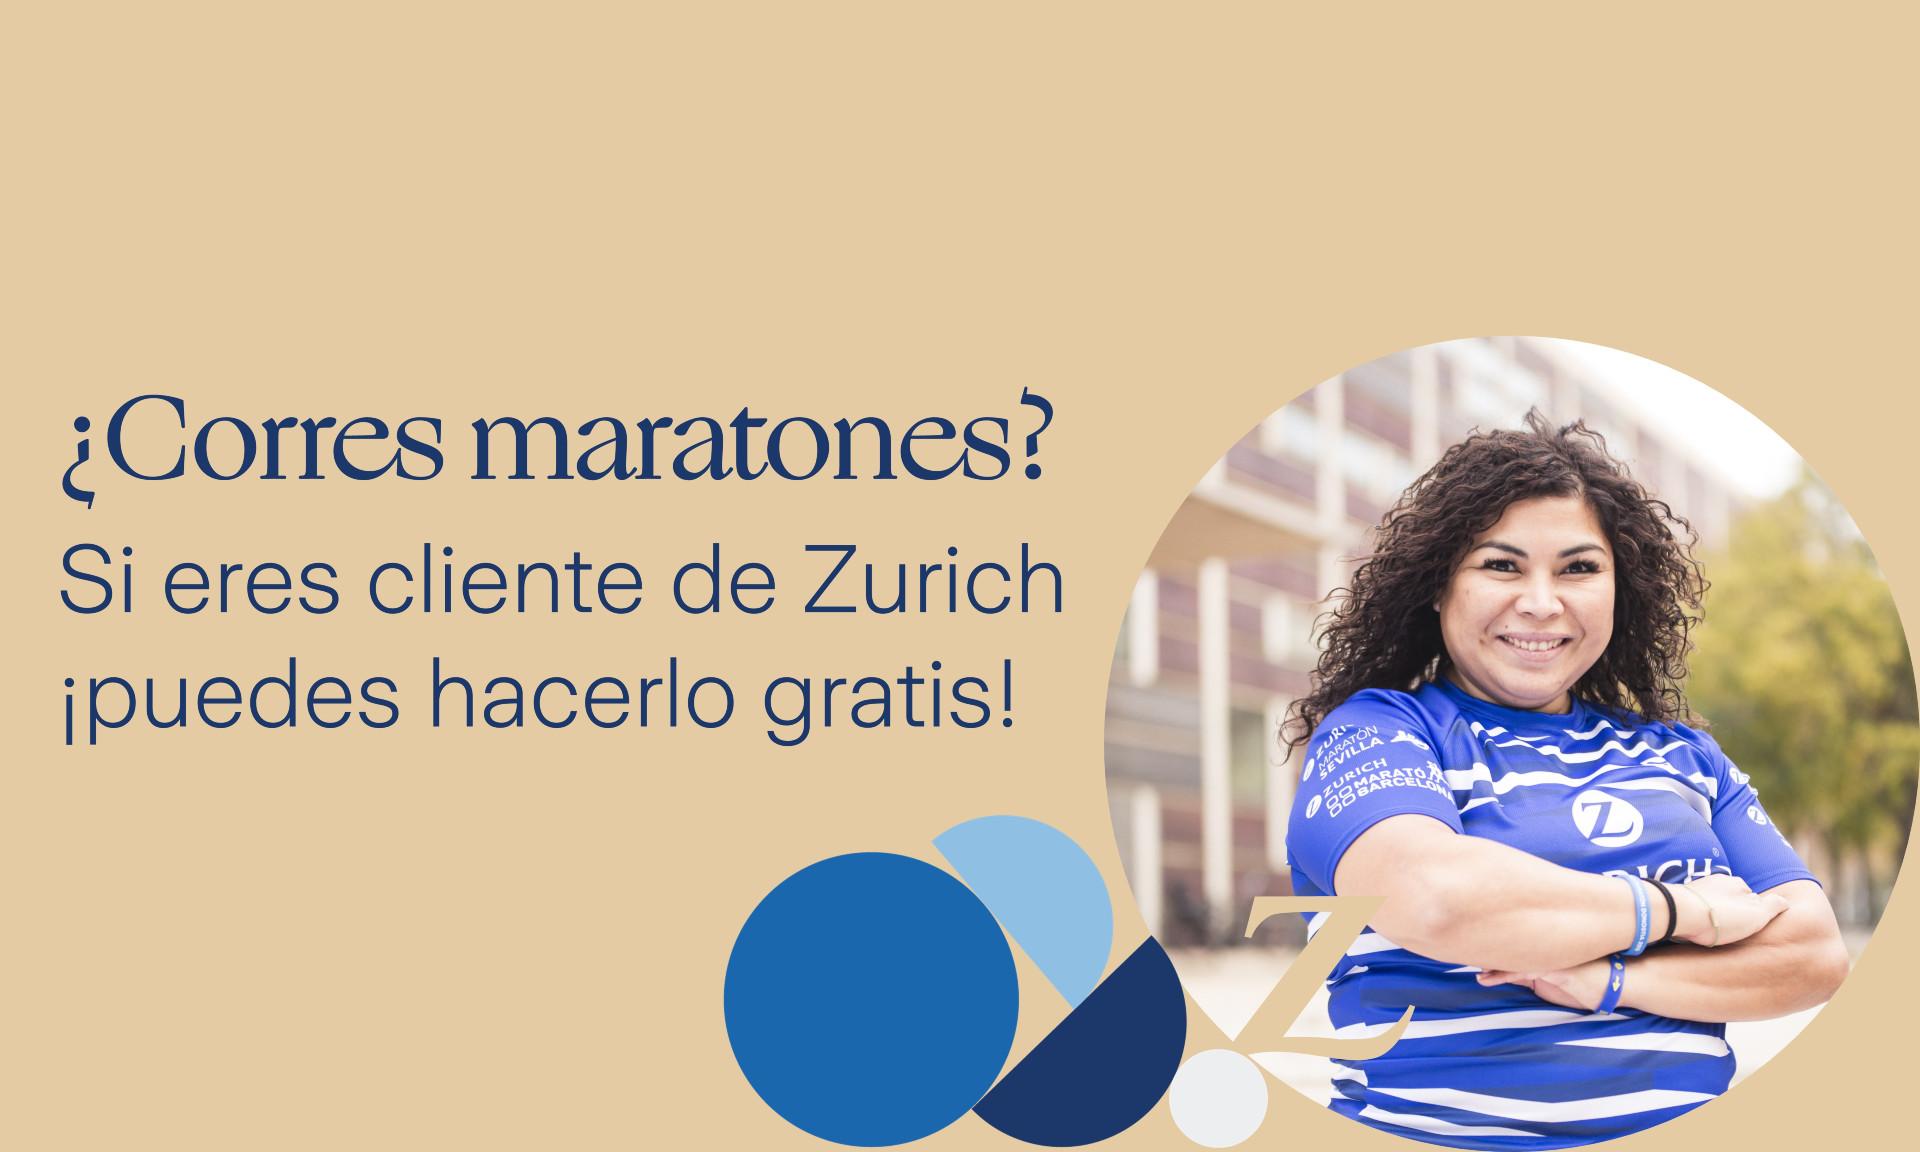 Promoción MARATÓN ZURICH